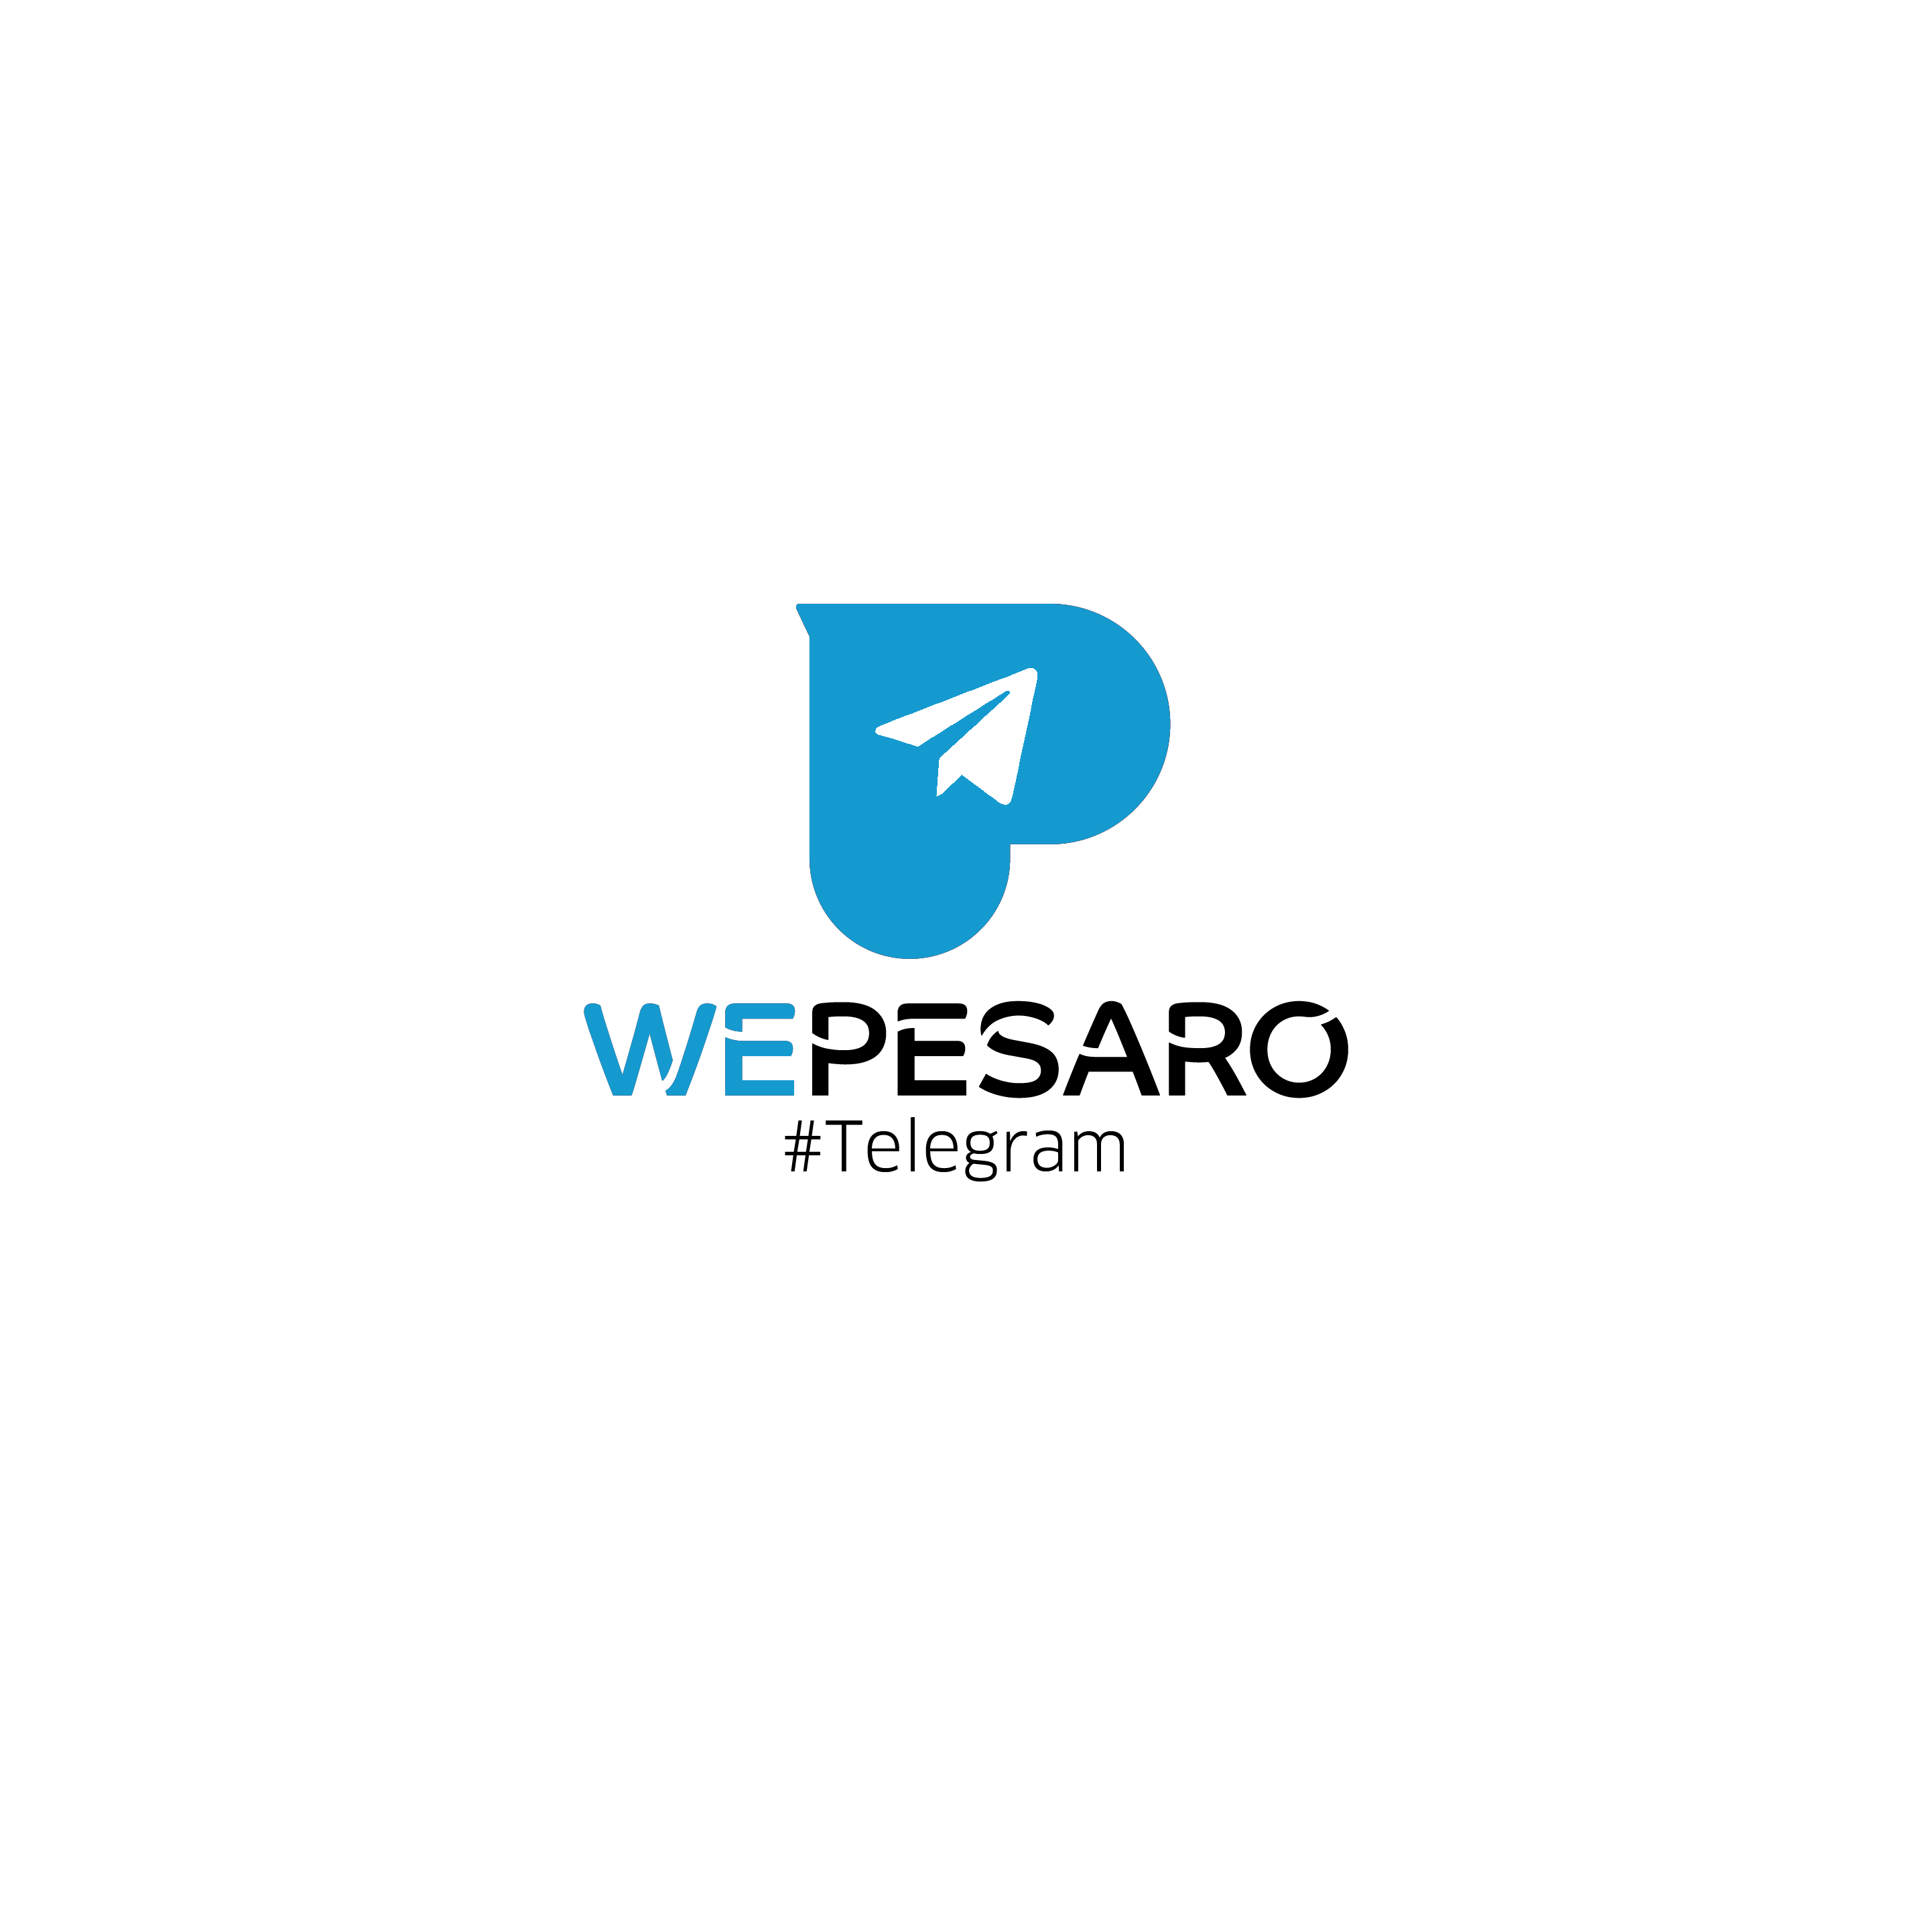 immagine Telegram Comune di Pesaro